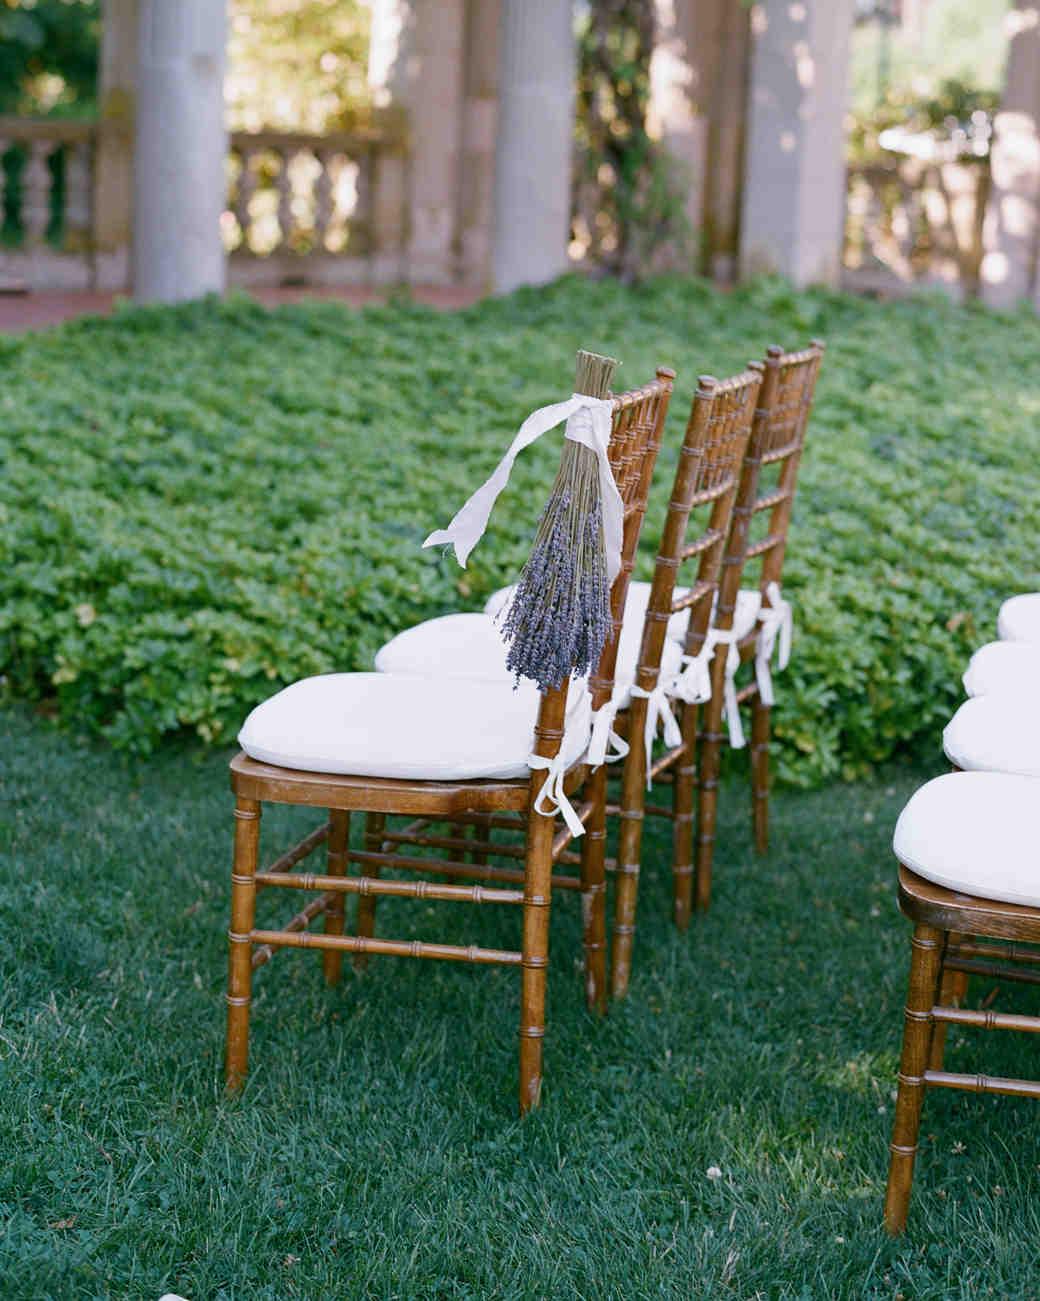 tara-nick-wedding-connecticut-160-s112082-0915.jpg